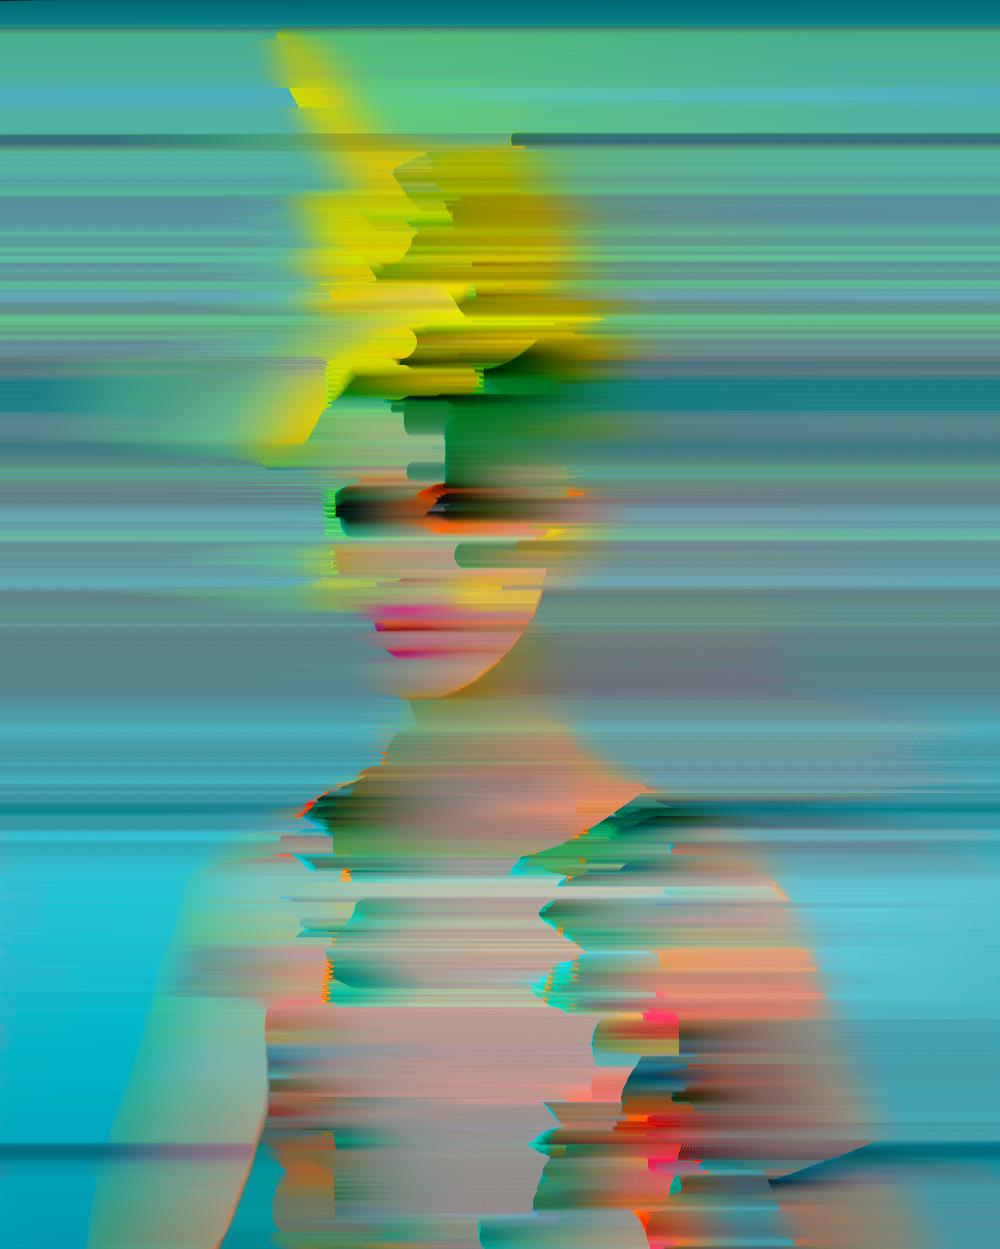 Matteo Mauro, Excessive Portraits, Midas